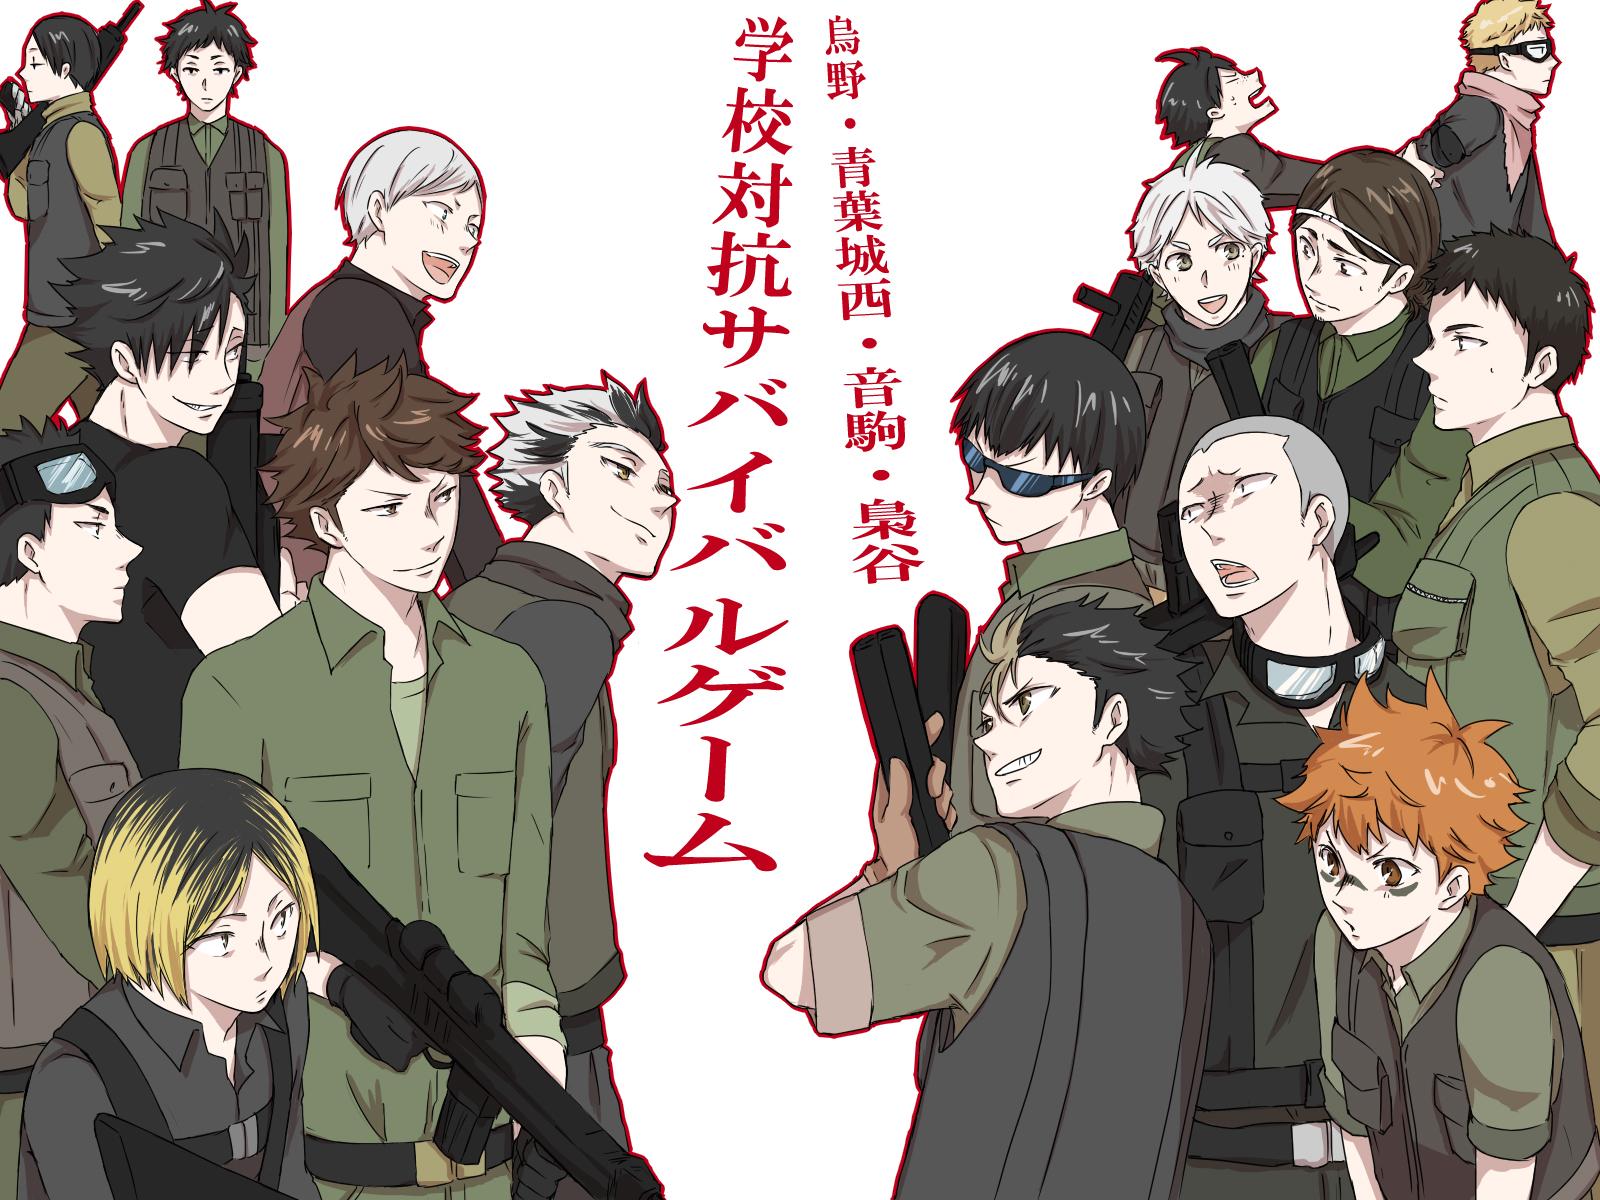 Haikyuu!!, Wallpaper - Zerochan Anime Image Board